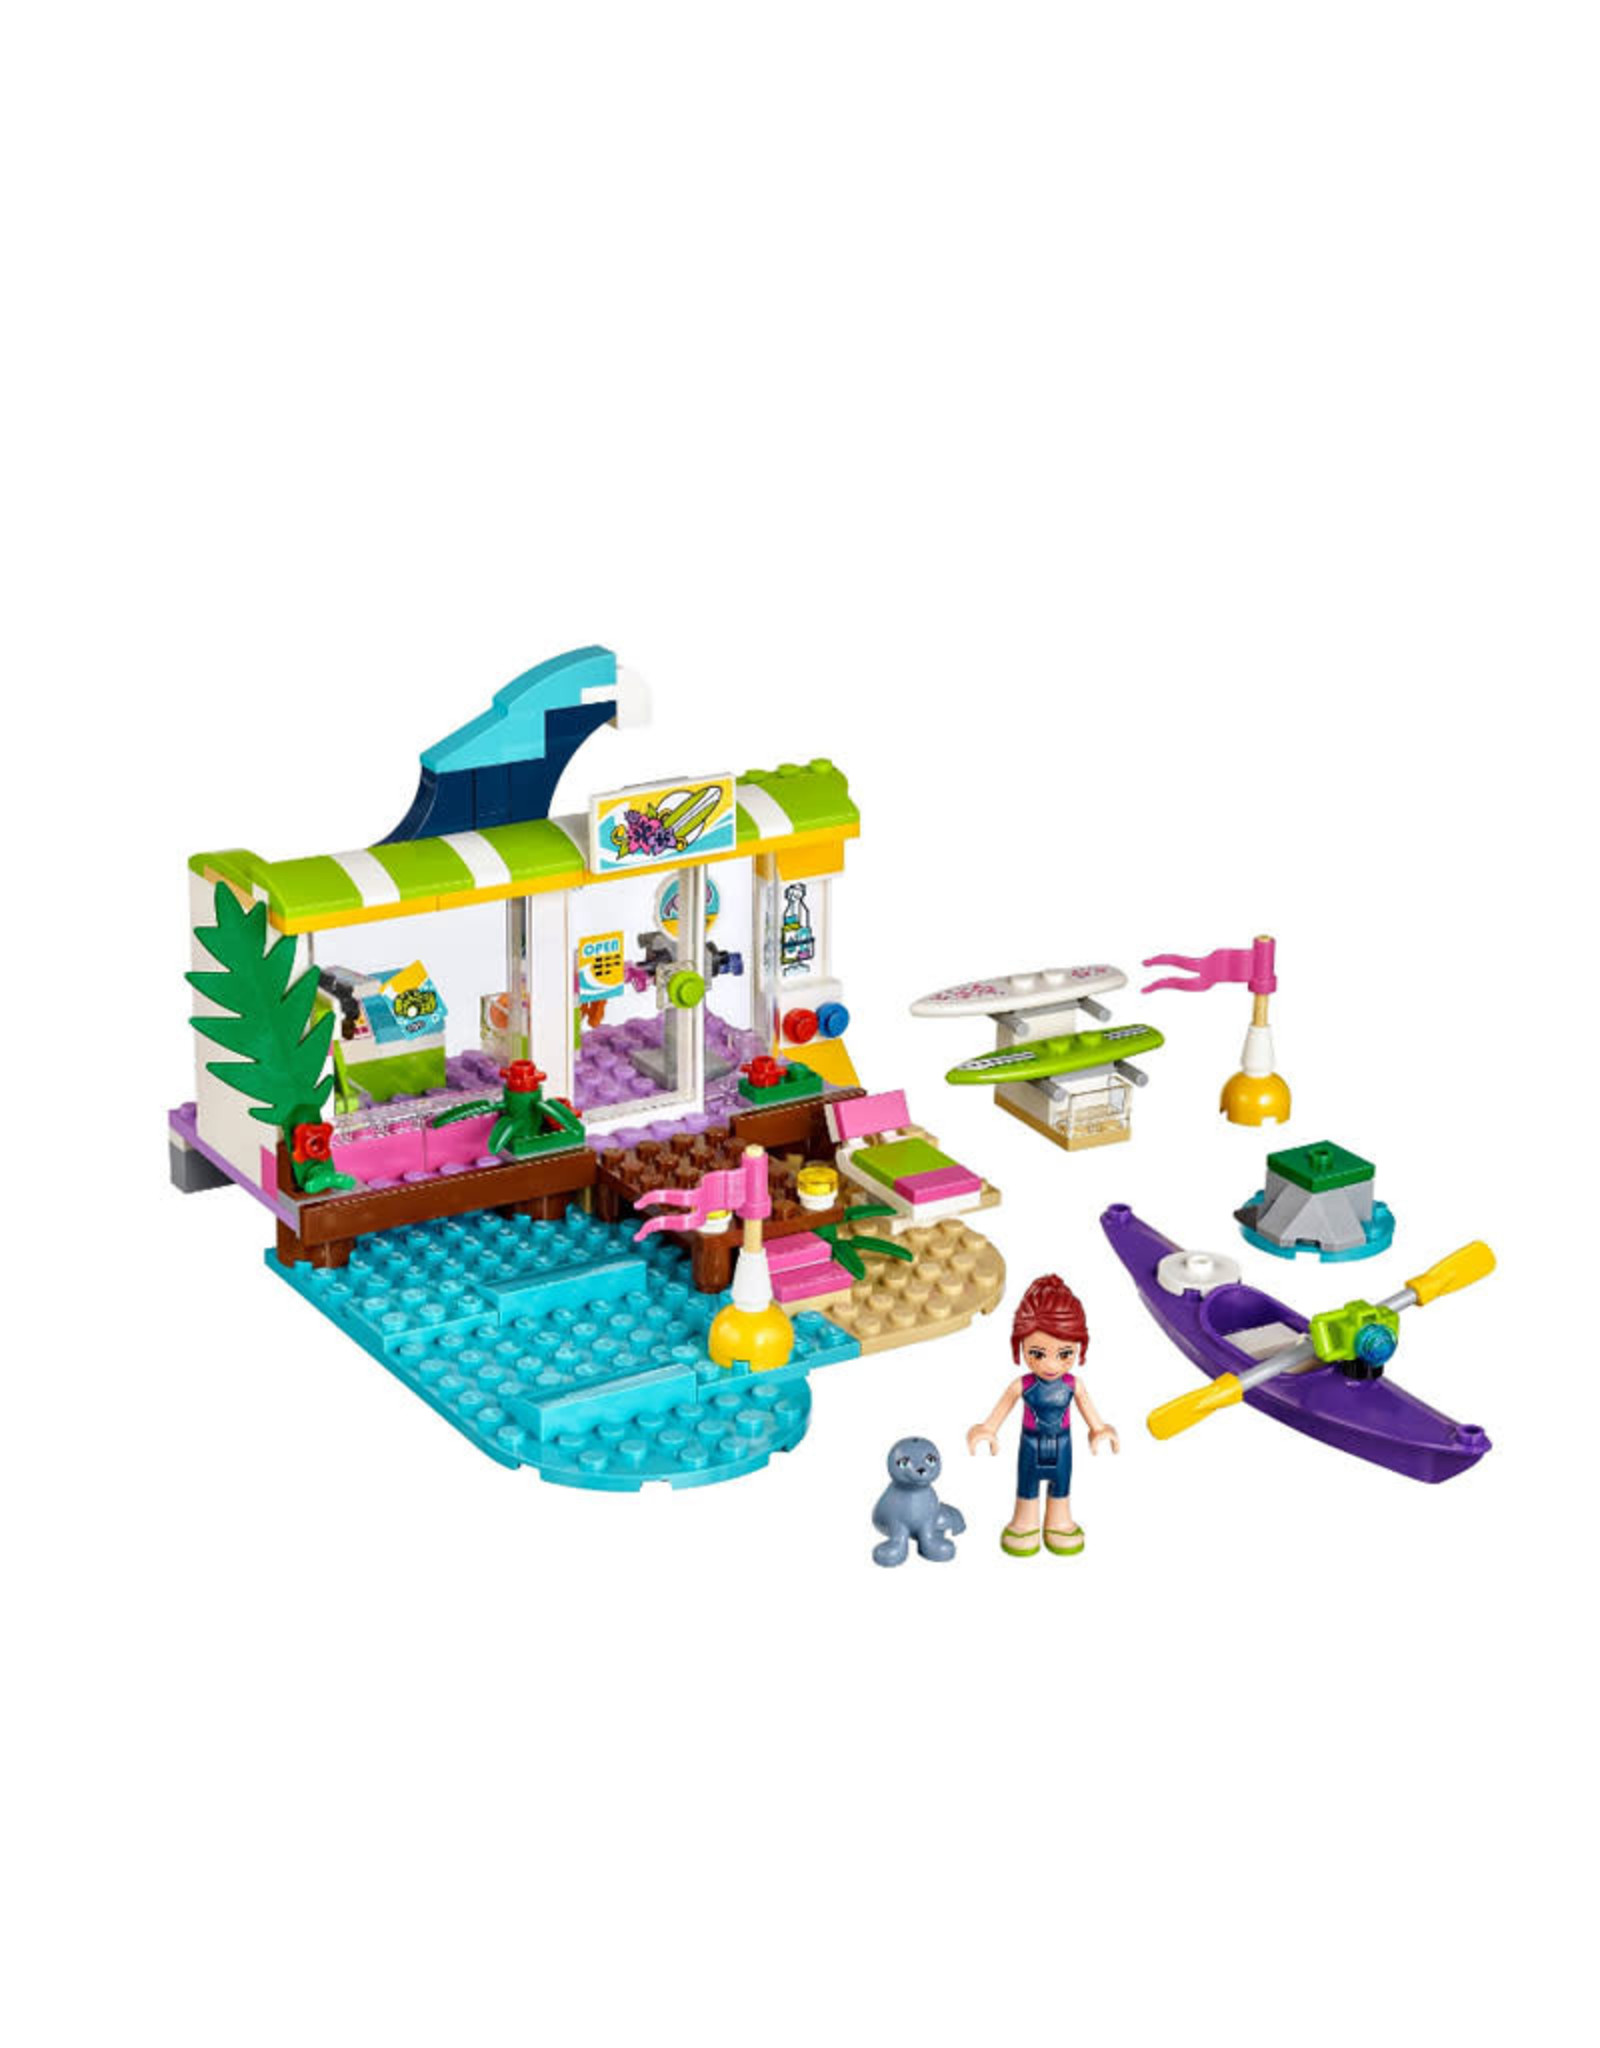 LEGO LEGO 41315 Heartlake Surf Shop FRIENDS